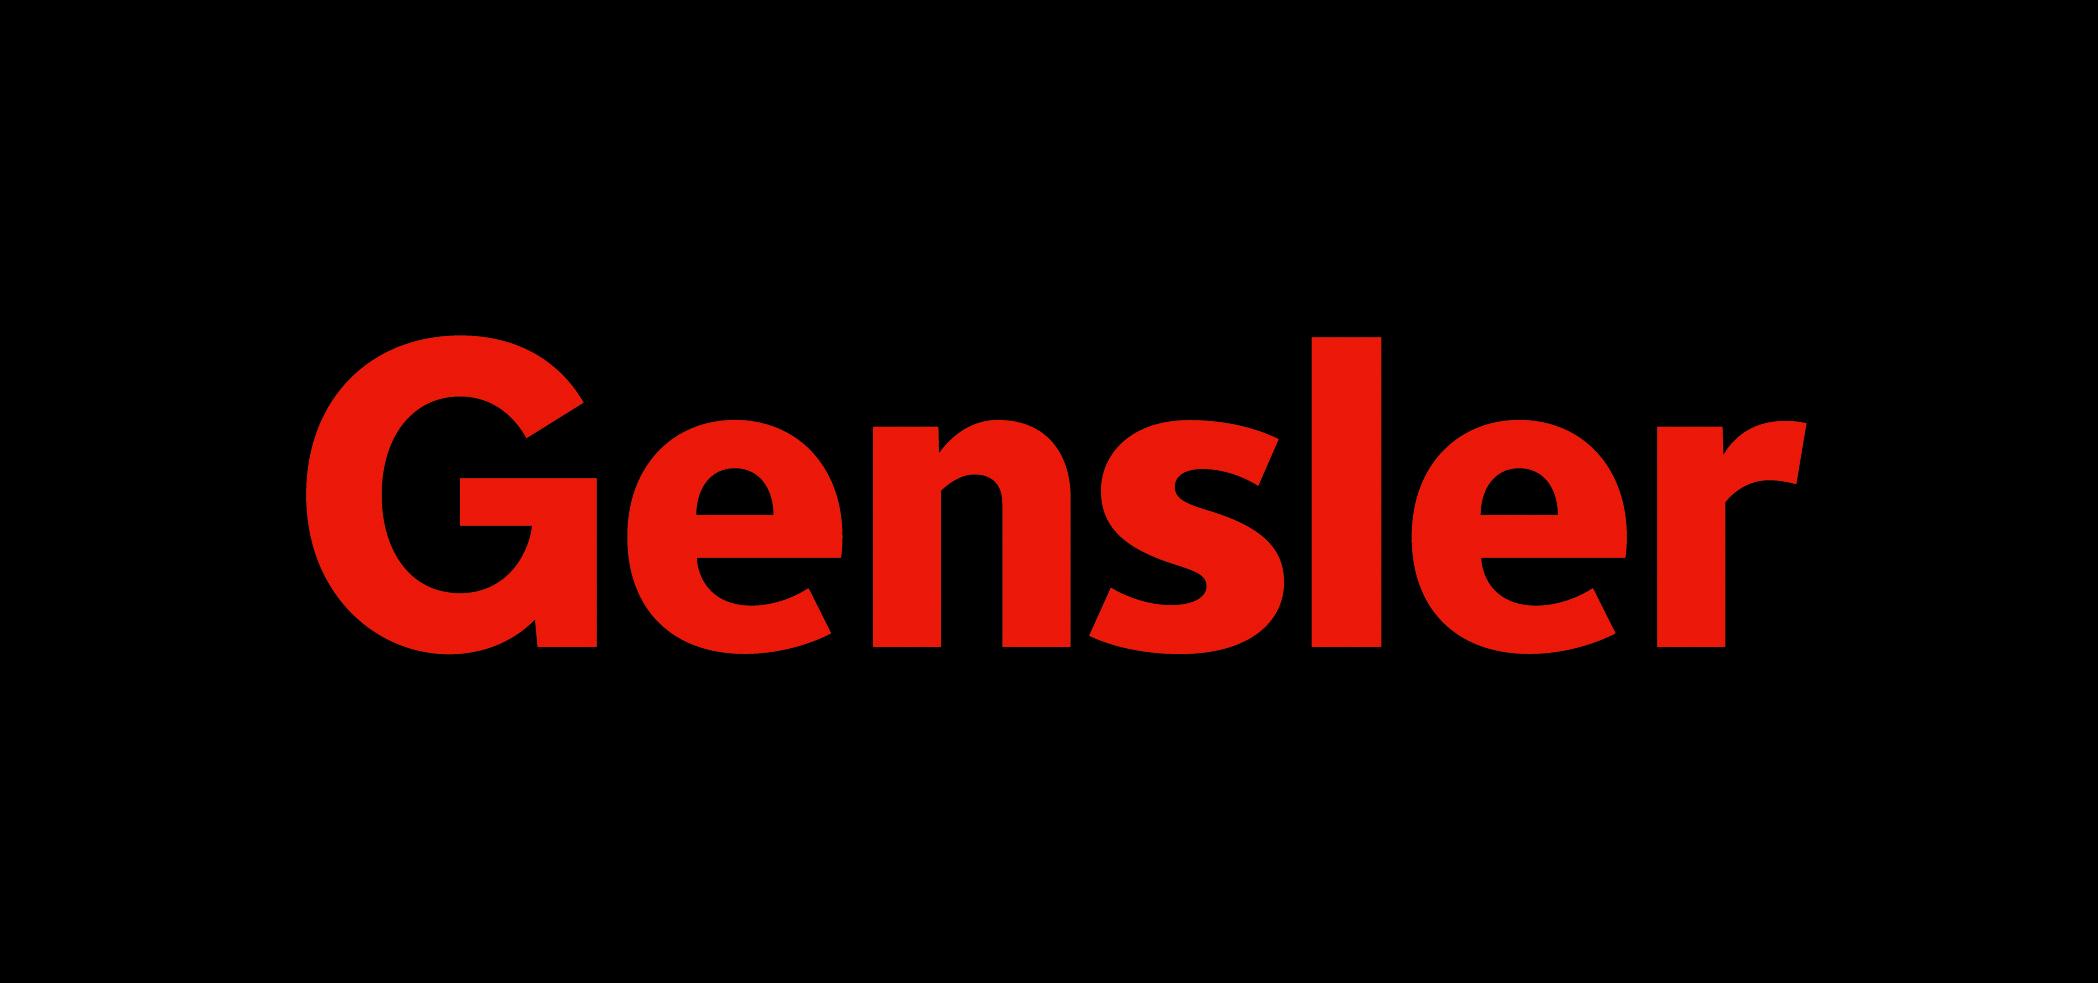 lgfw_genslerredprocess_300dpi.jpg